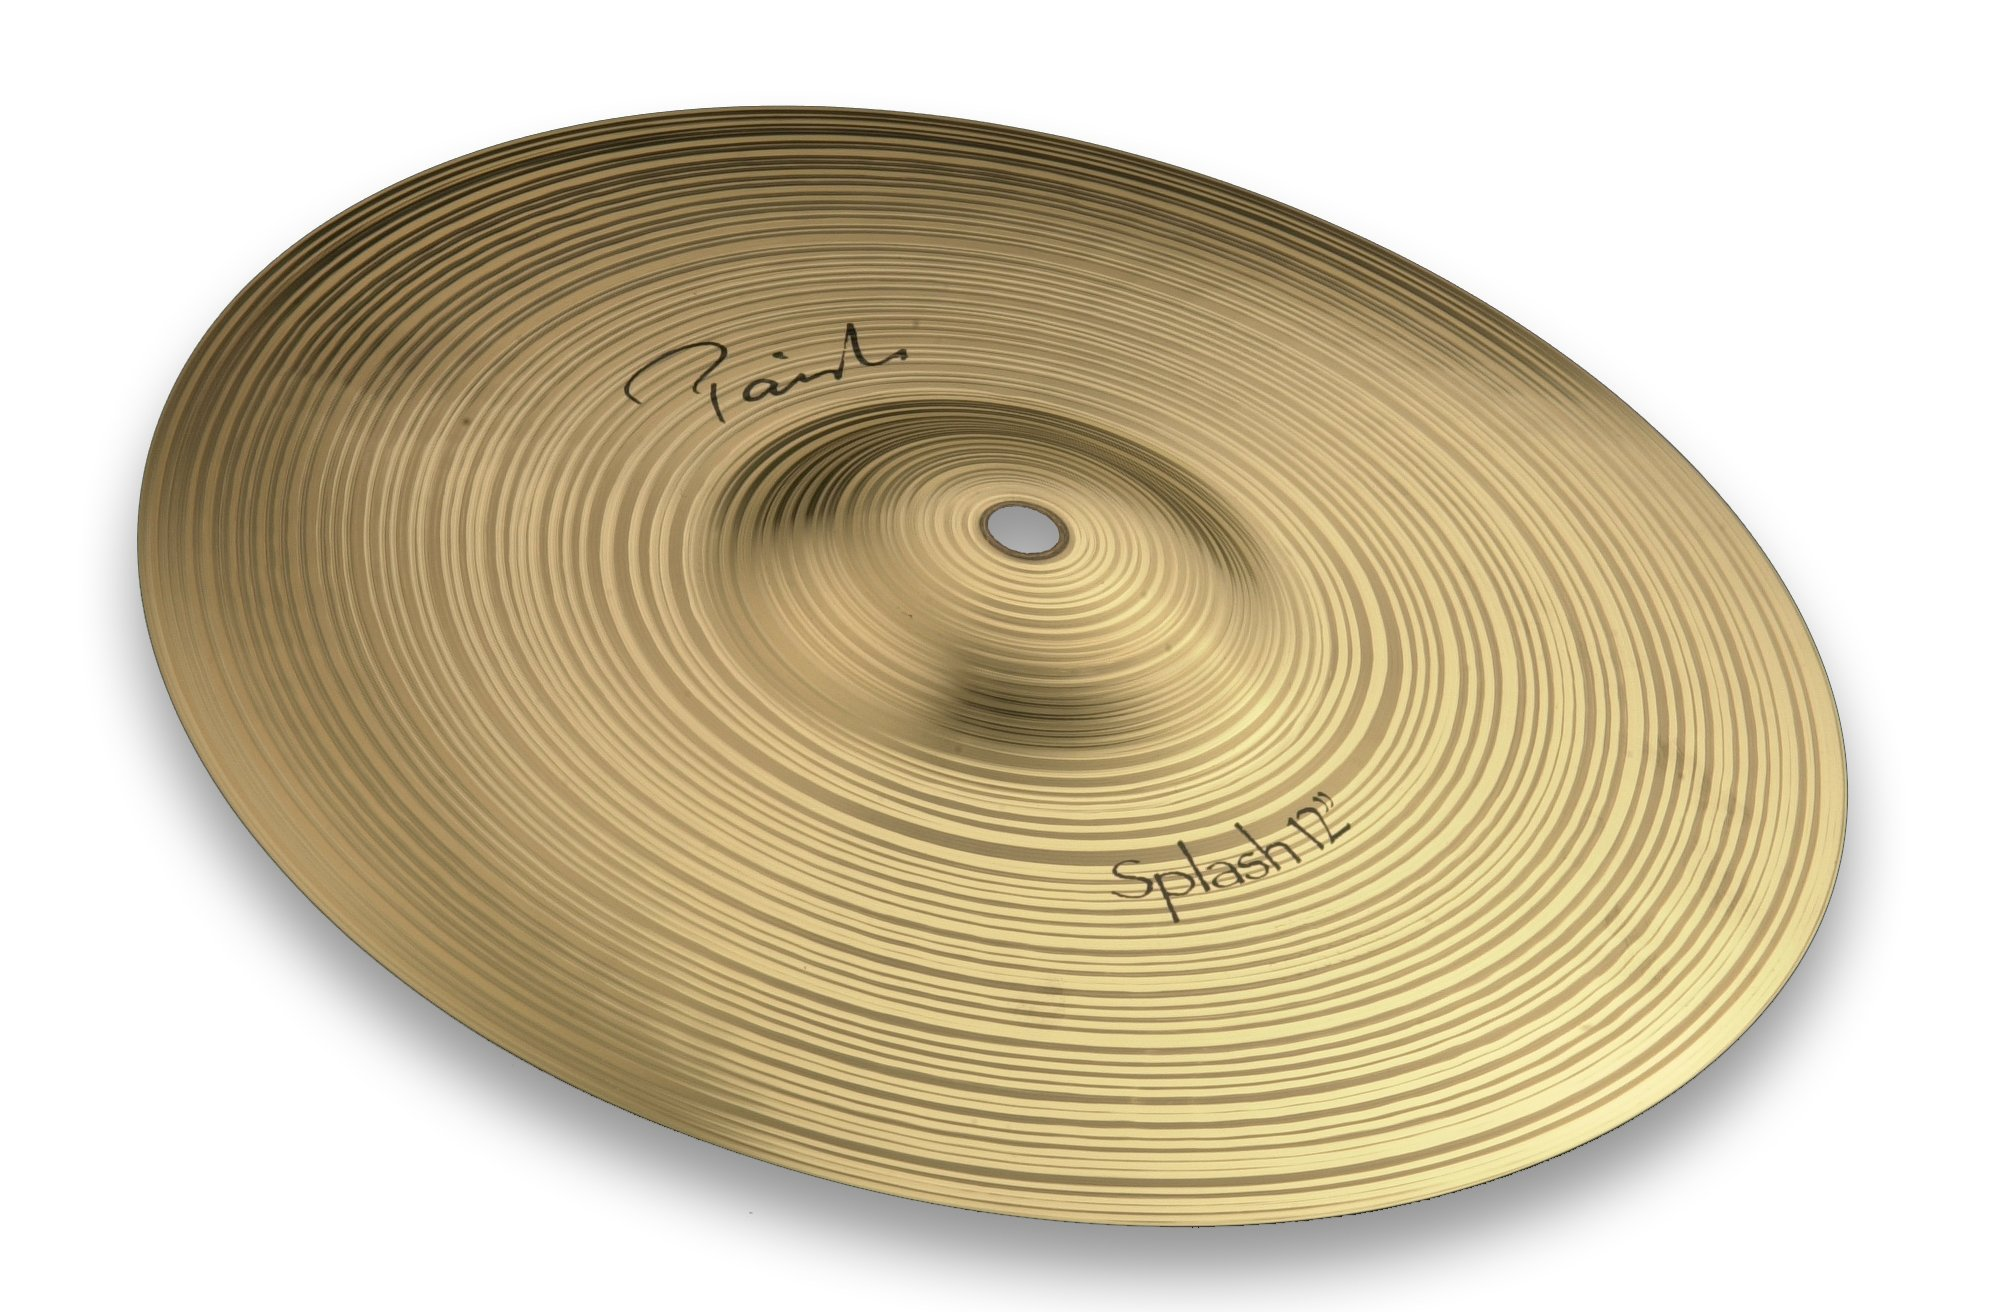 Paiste Signature Cymbal Splash 12-inch